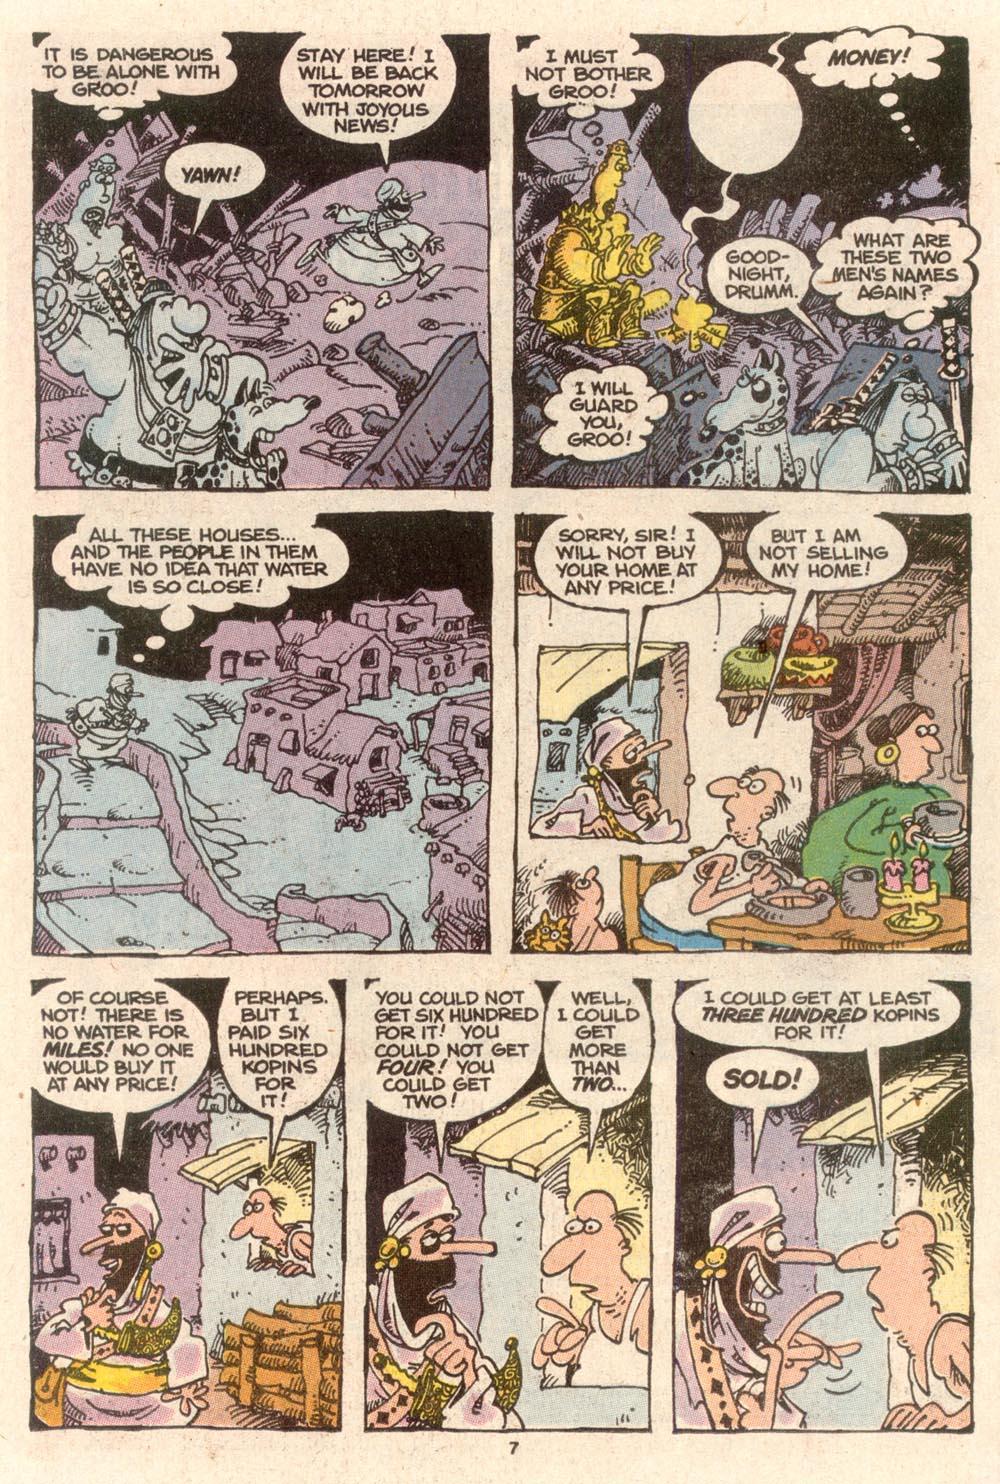 Read online Sergio Aragonés Groo the Wanderer comic -  Issue #63 - 7